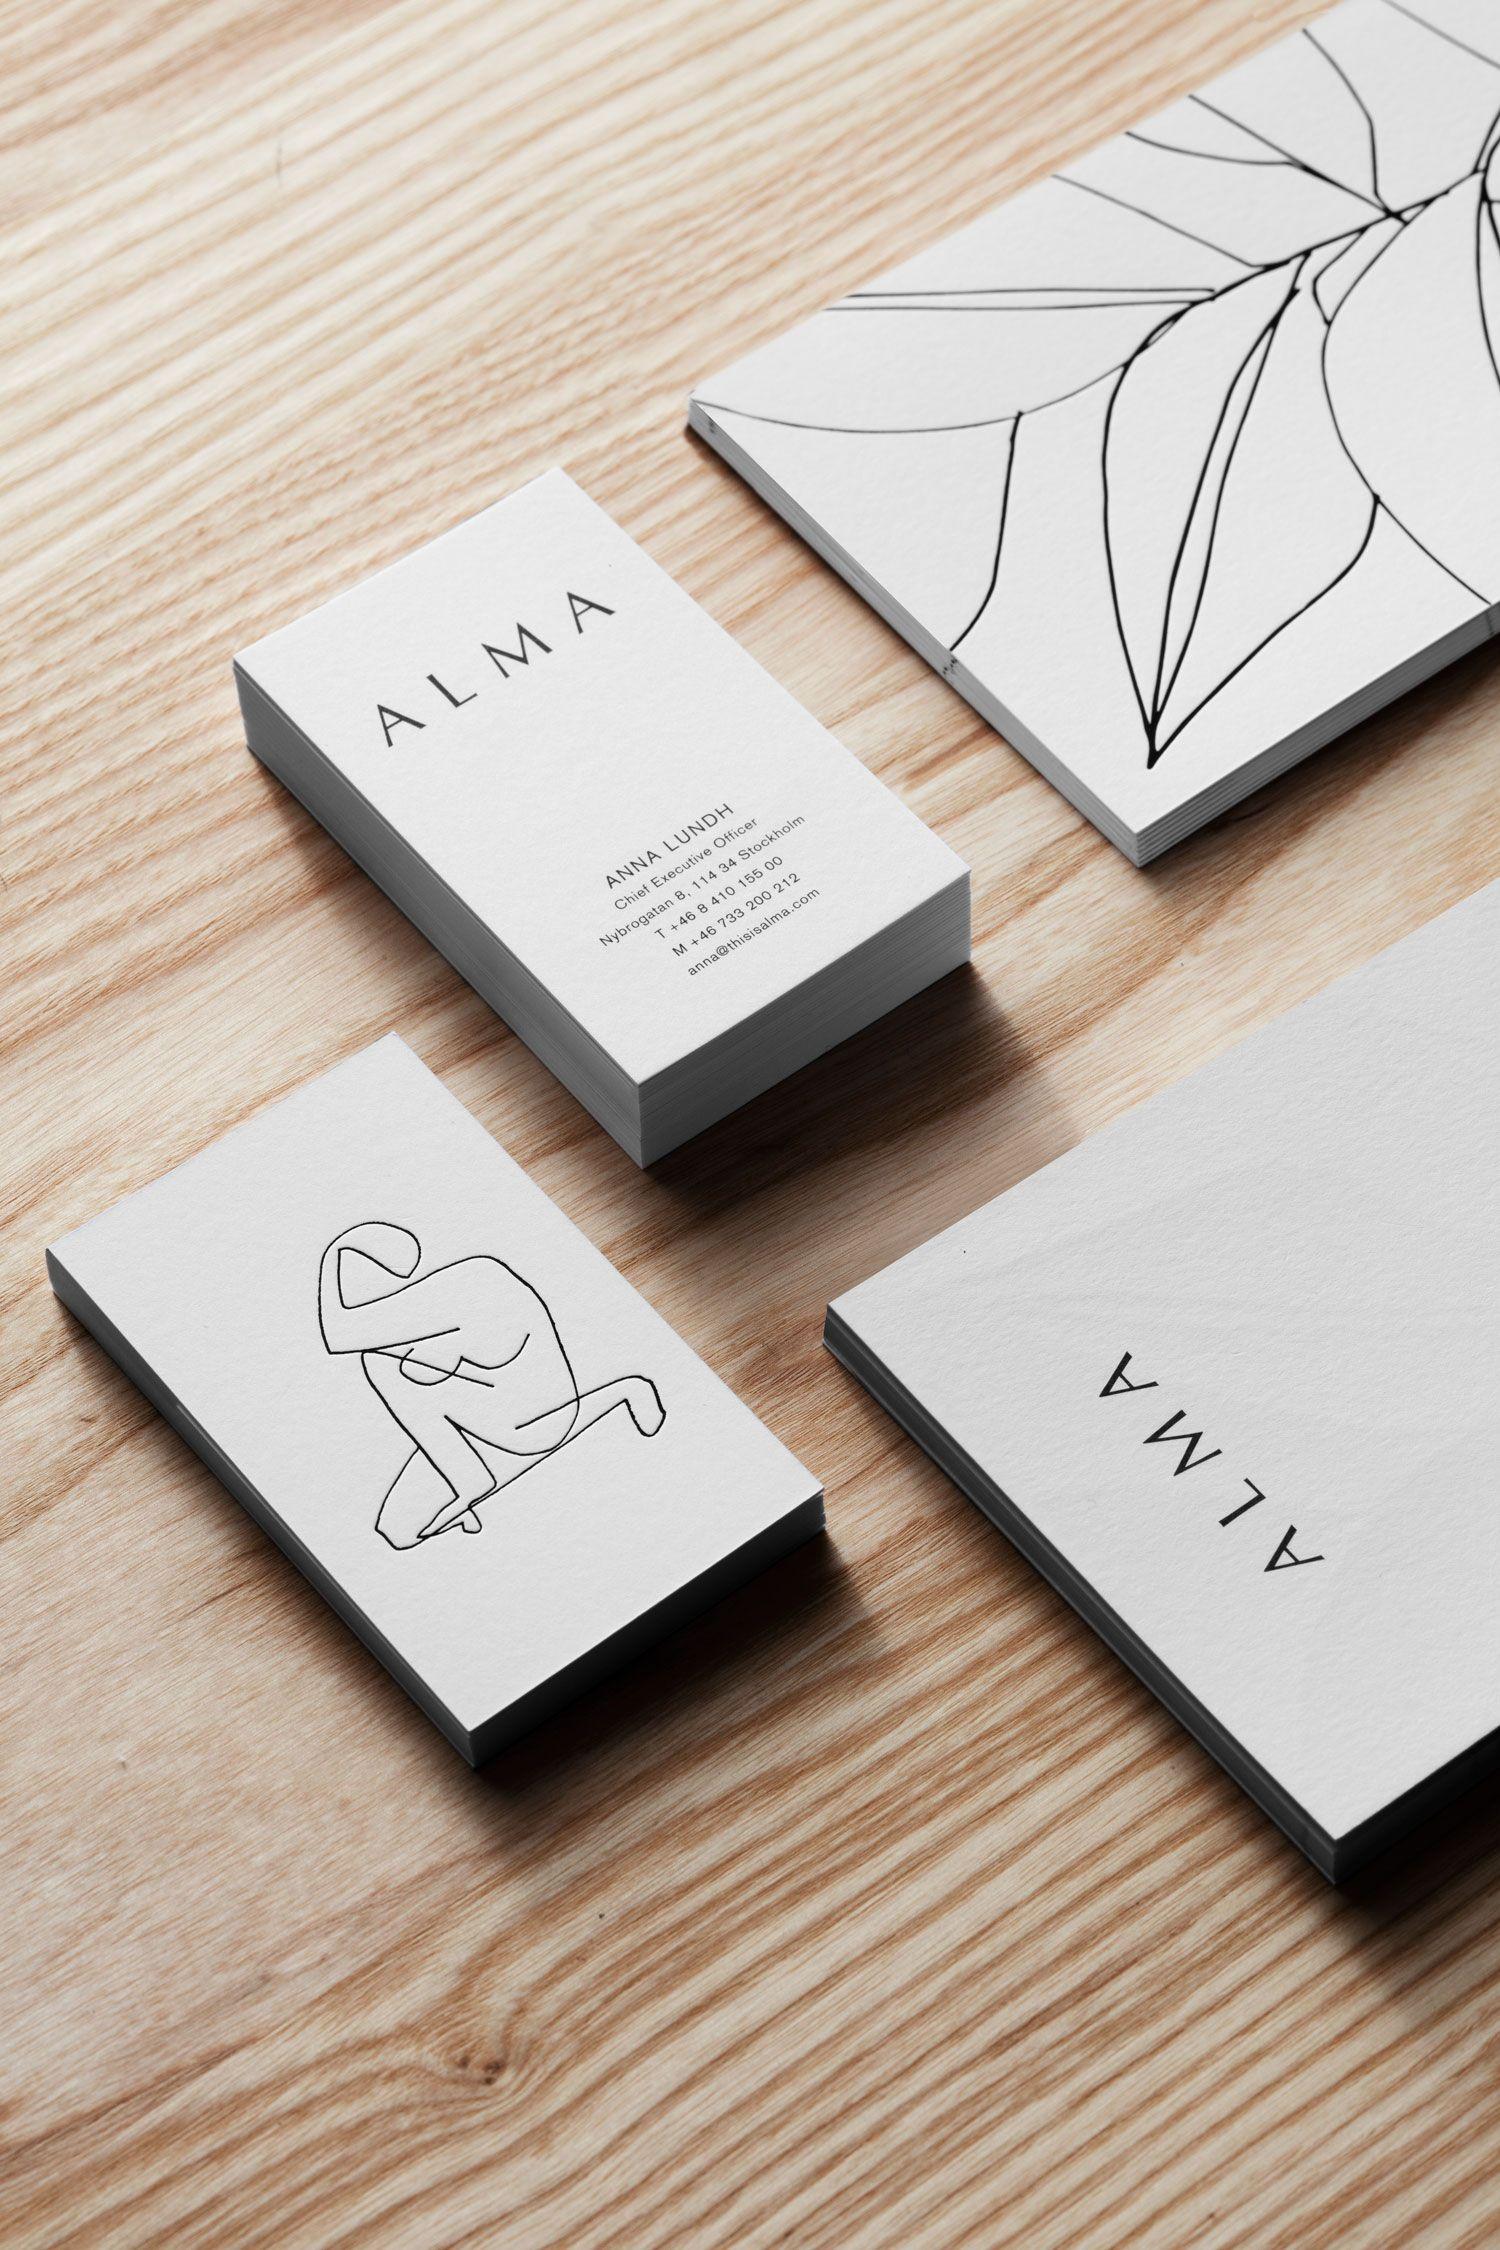 Alma Stockholm: Member\'s Club For Creatives by Tham & Videgård ...